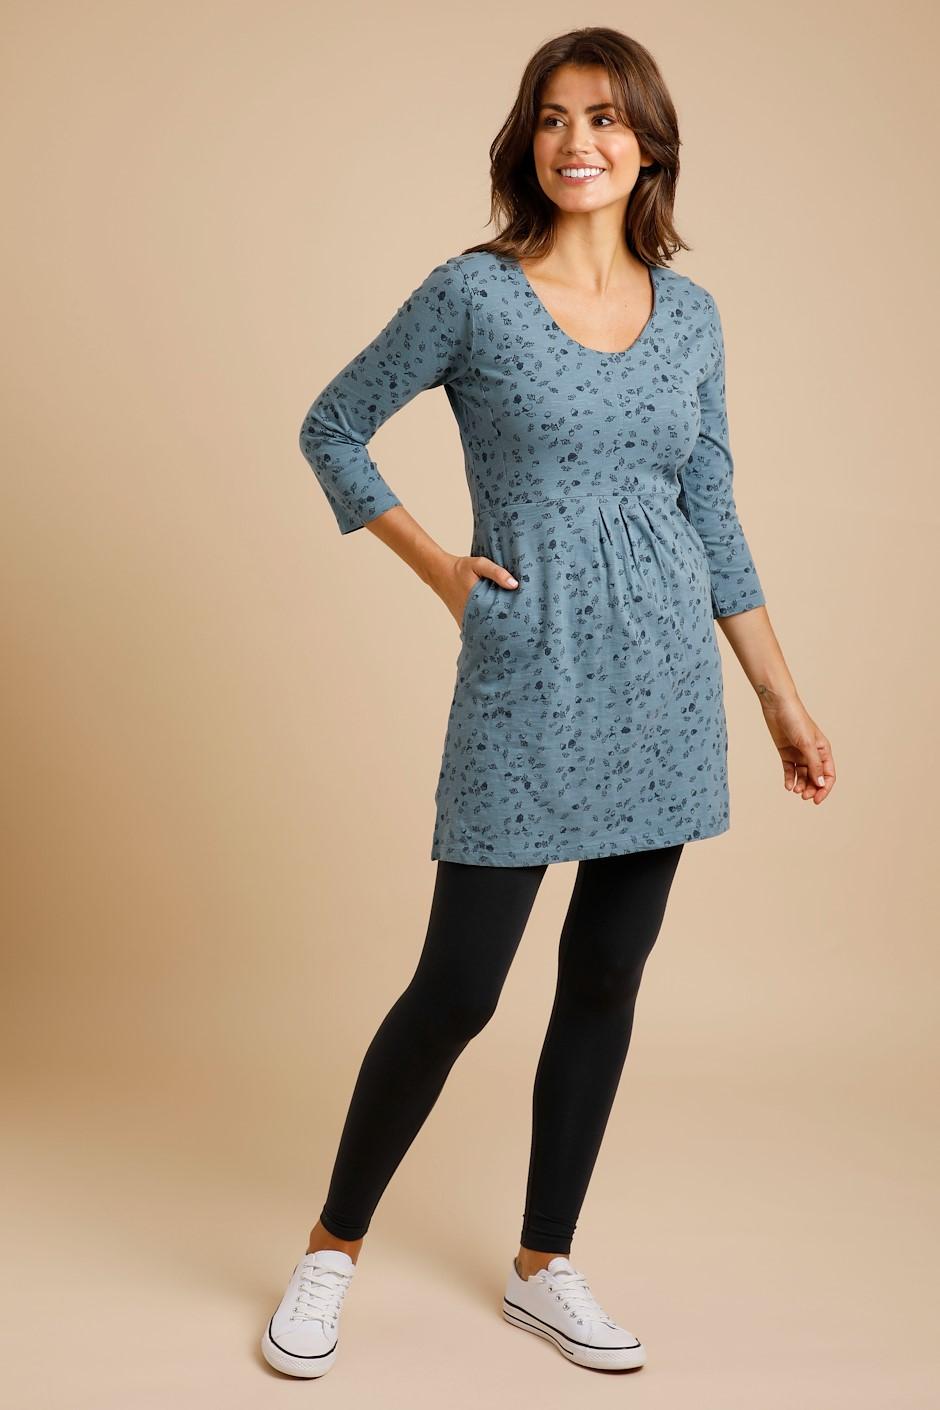 Dyed Cedar Garment Cotton Printed Tunic Blue Mirage